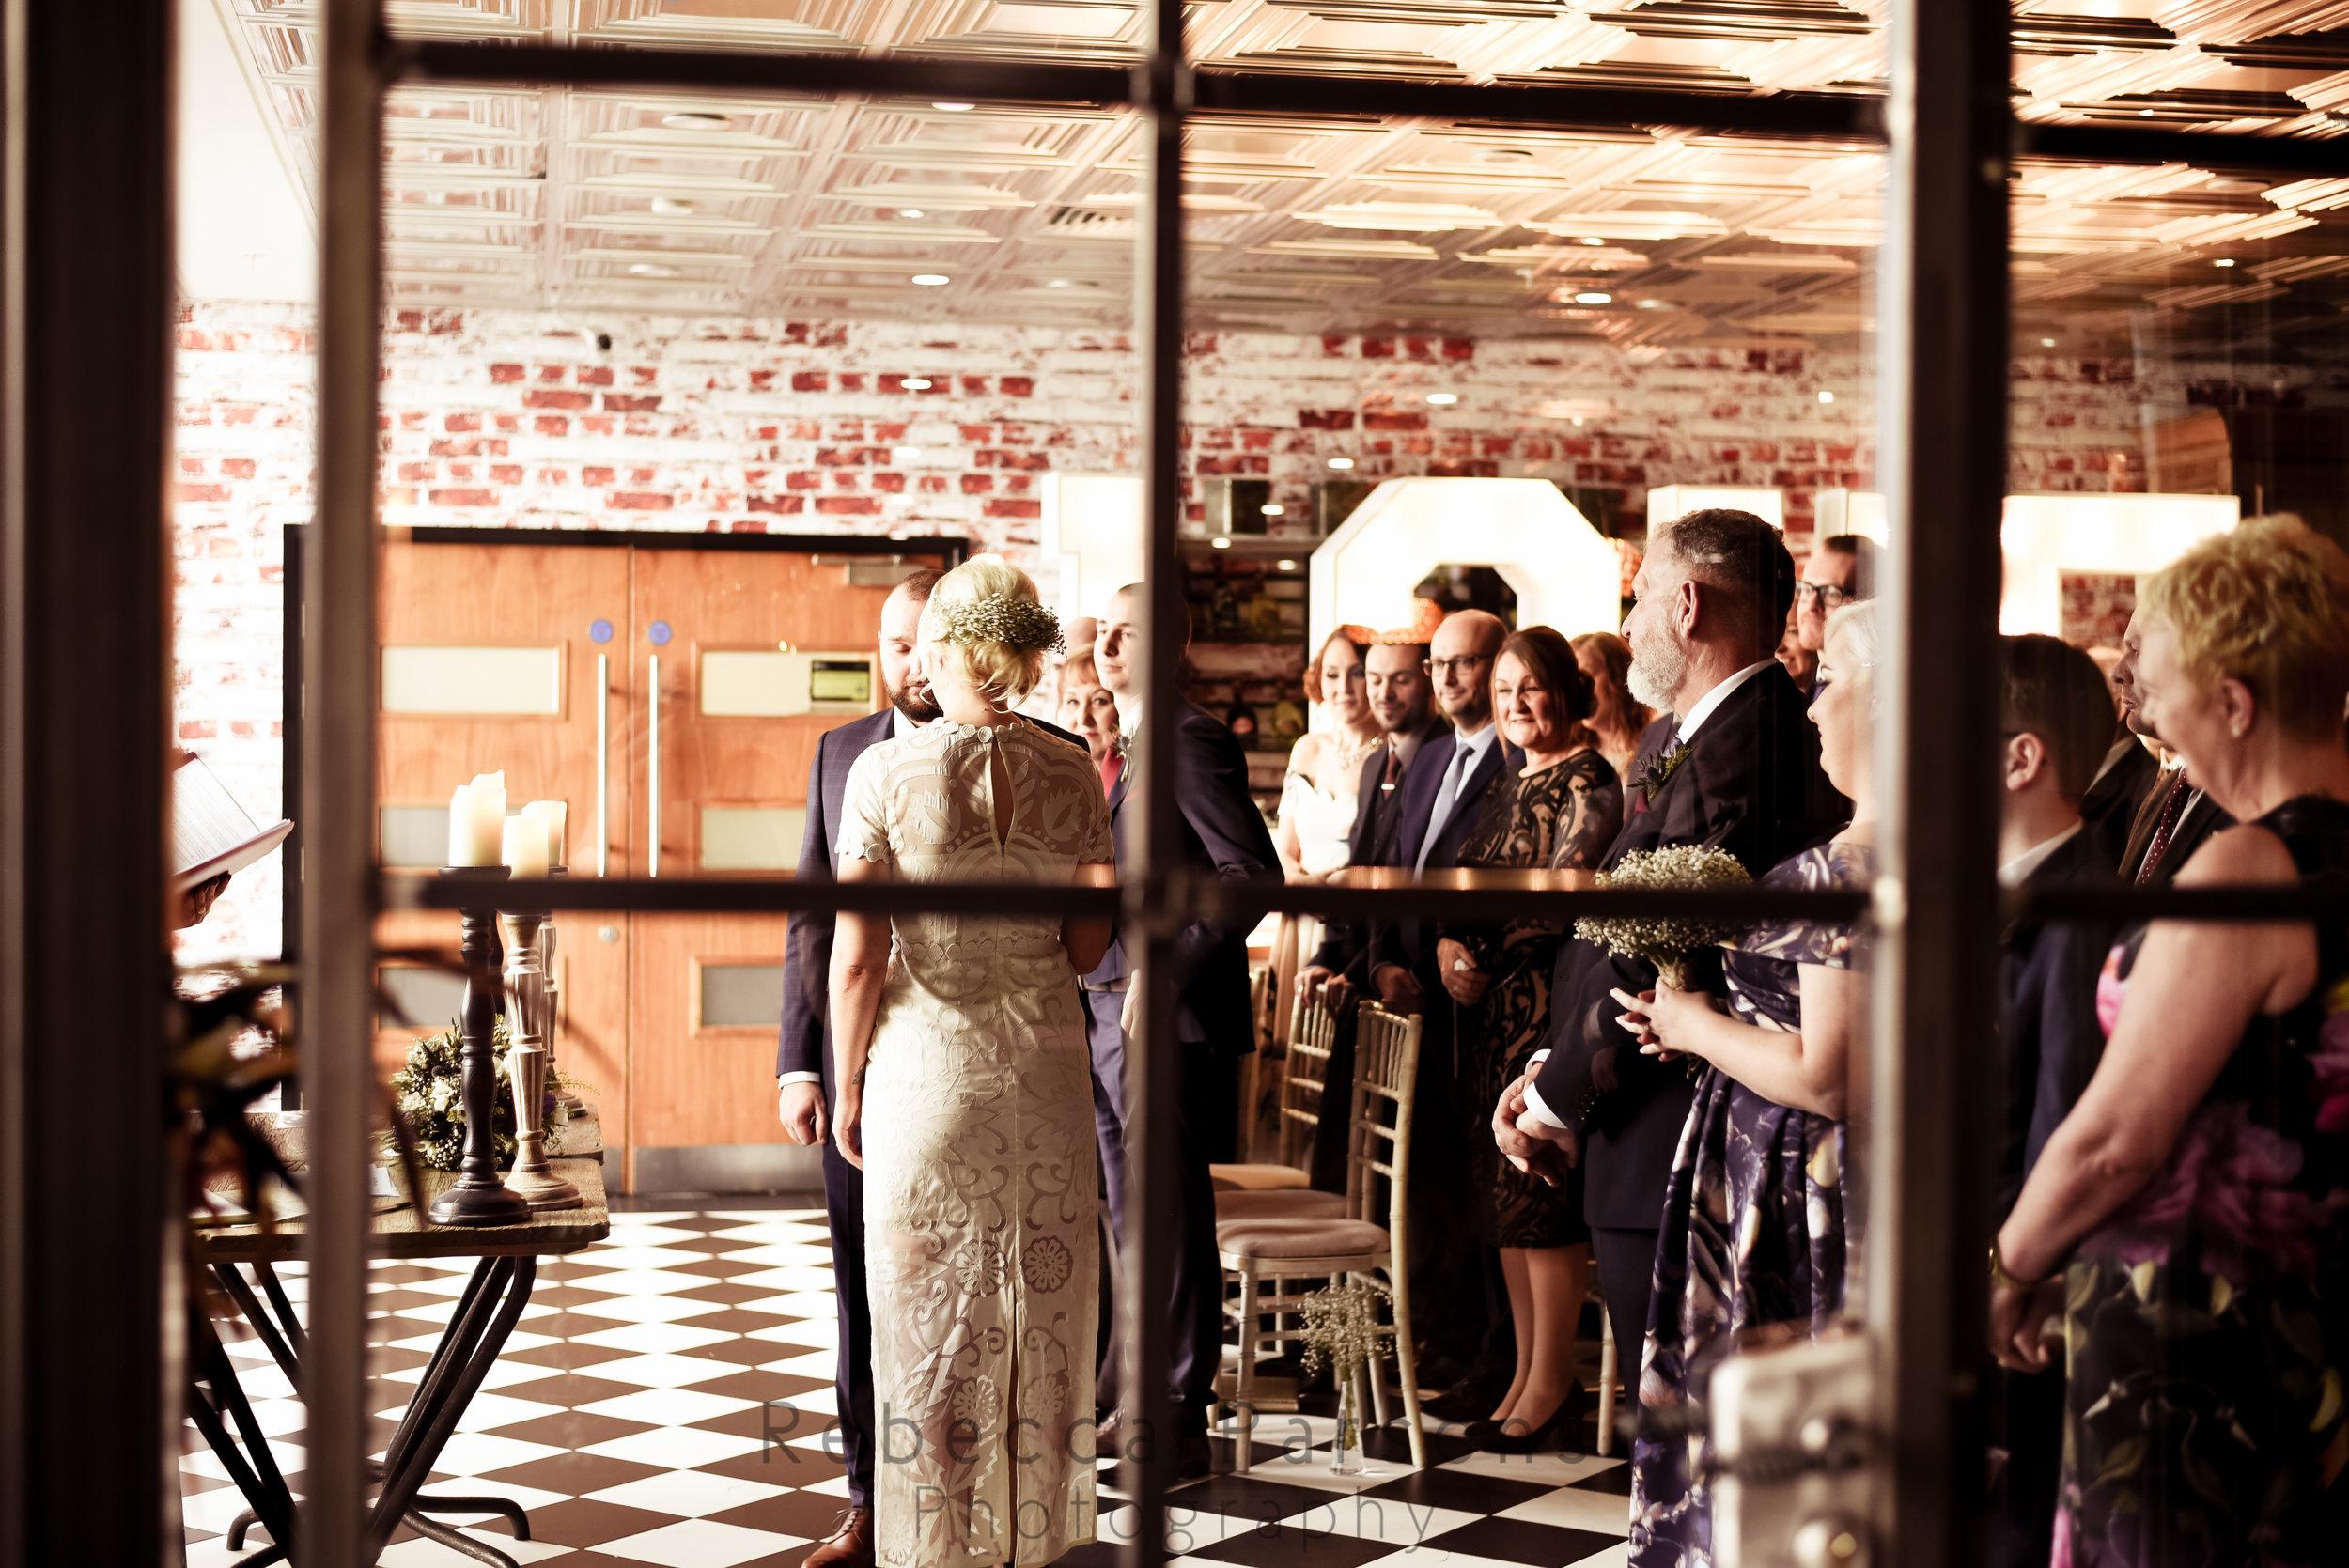 Bride and groom saying vows through doorway